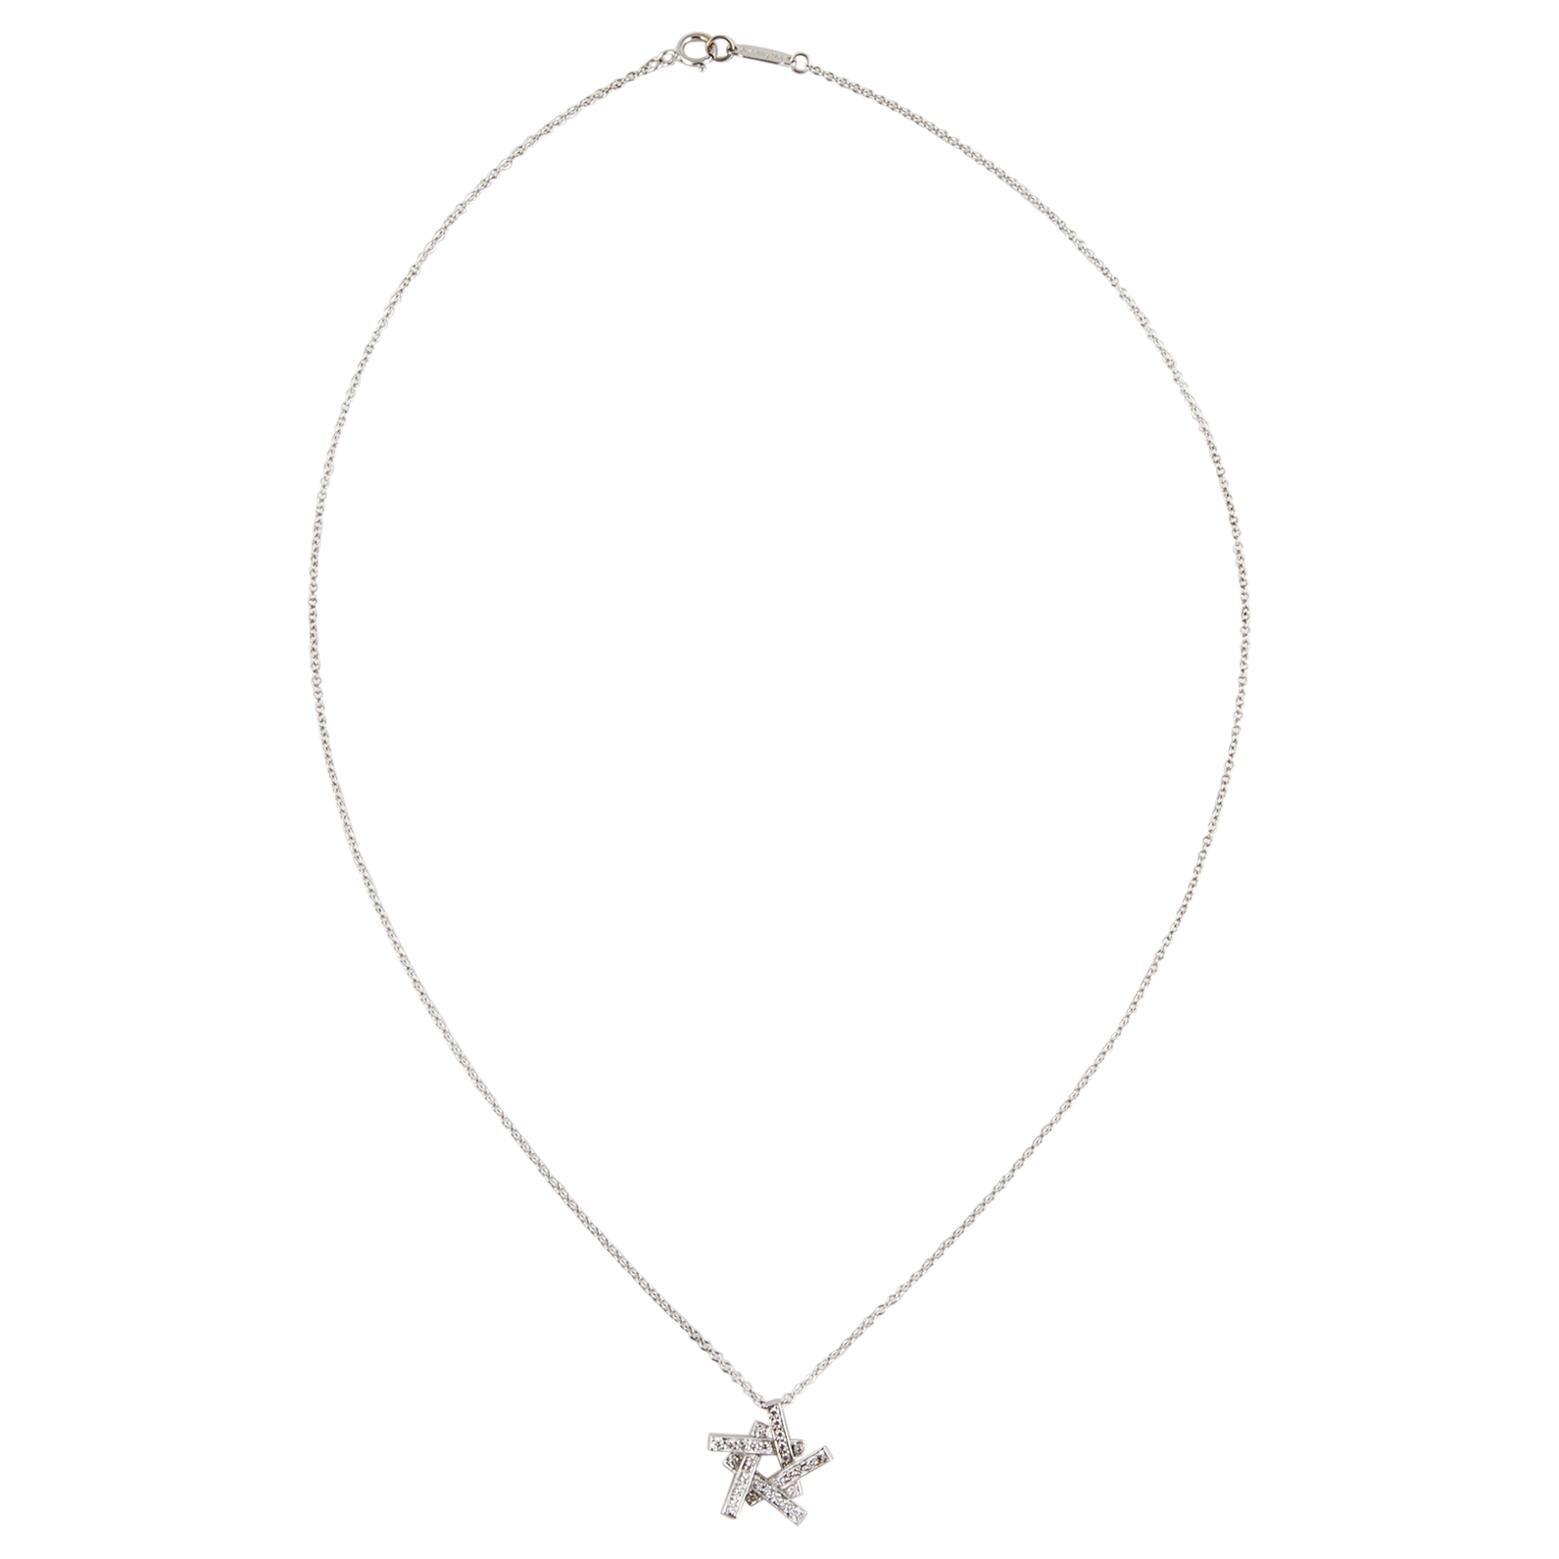 Tiffany & Co. Axis 18K White Gold Diamond Pendant Necklace